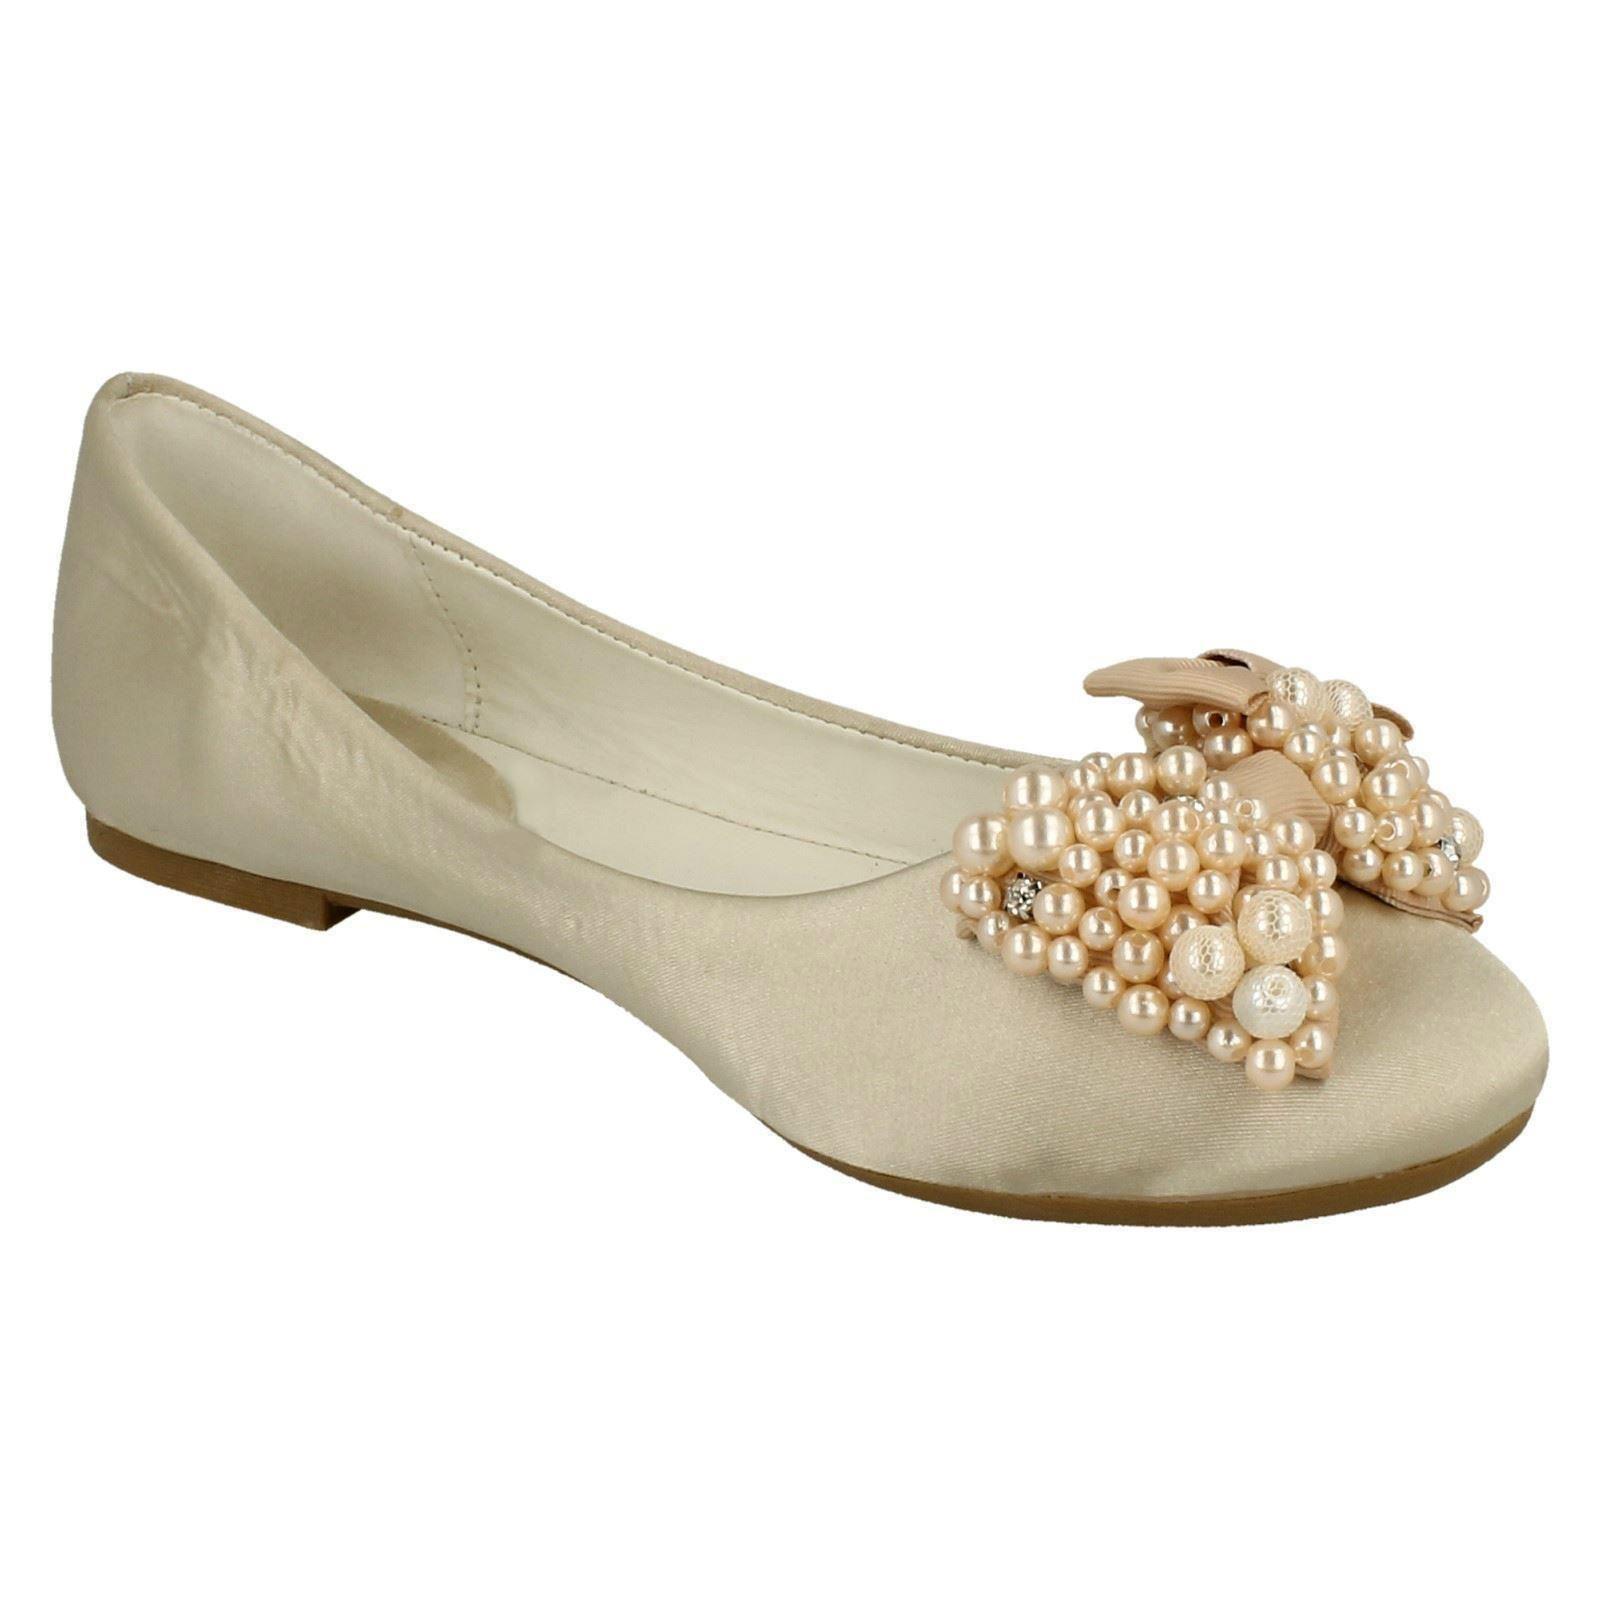 Ladies Spot on Bow Ballerine /'Flats/'